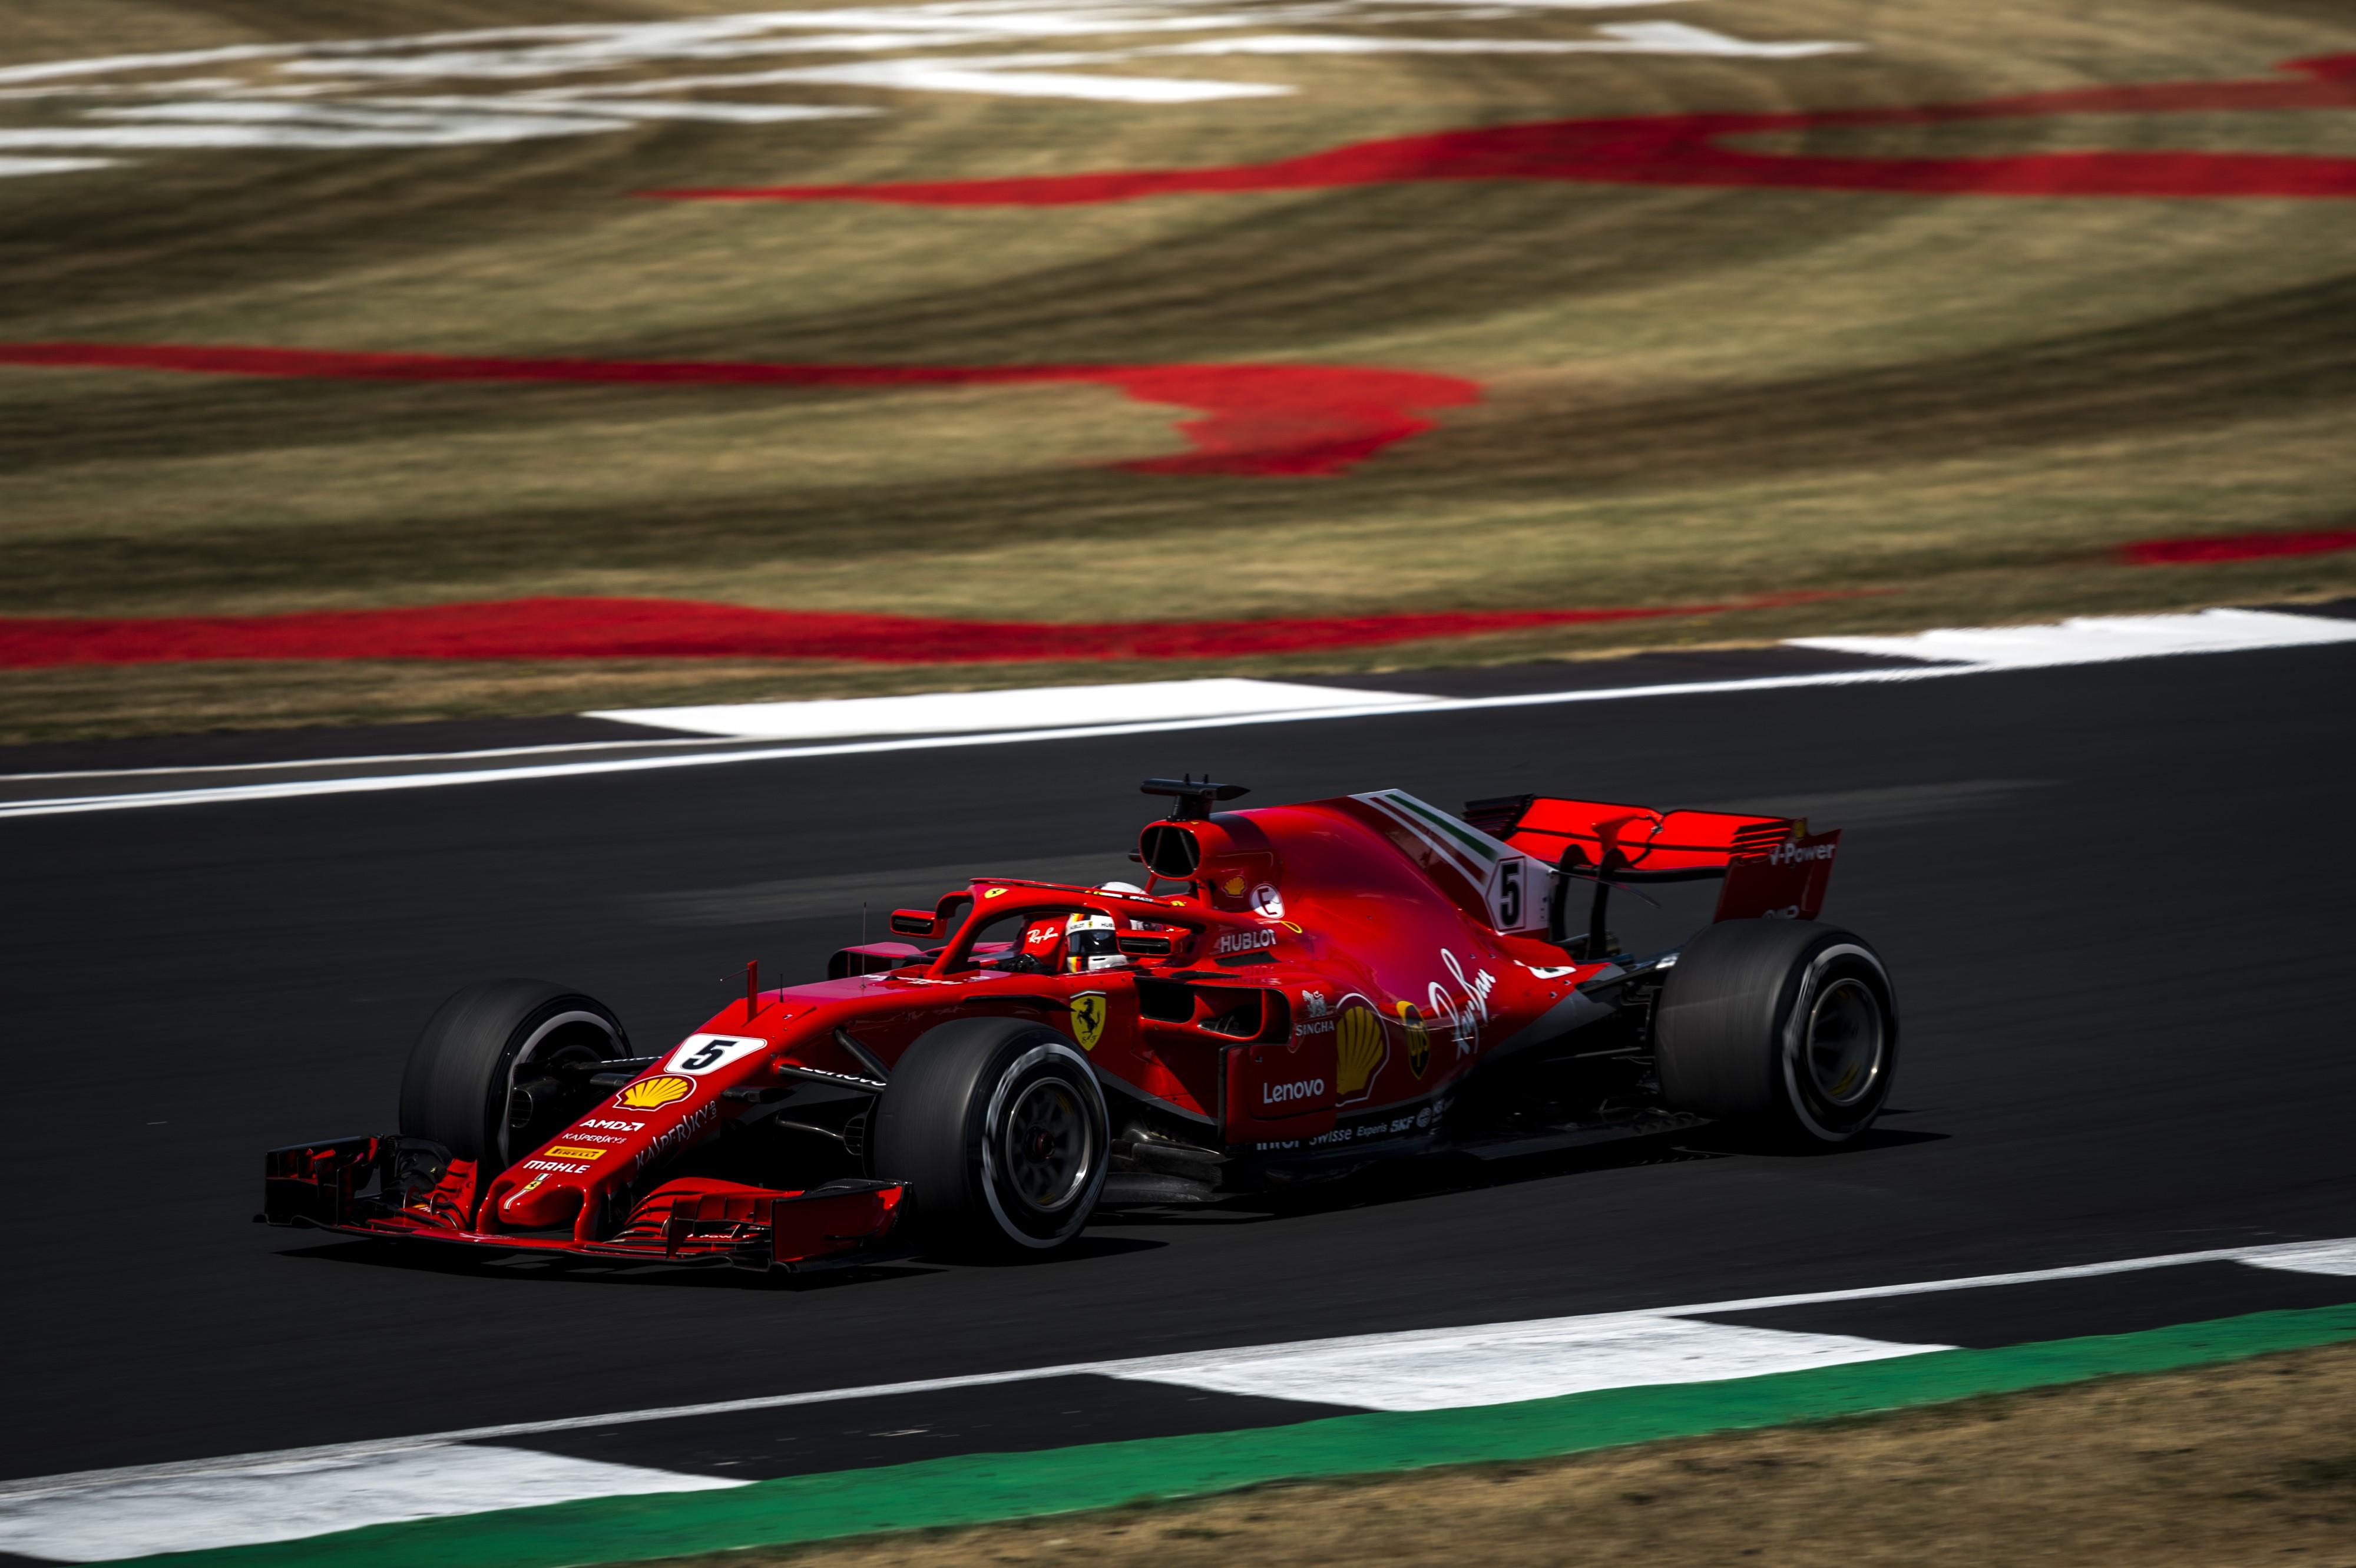 Sebastian Vettel (Ferrari) au Grand Prix de Grande-Bretagne 2018